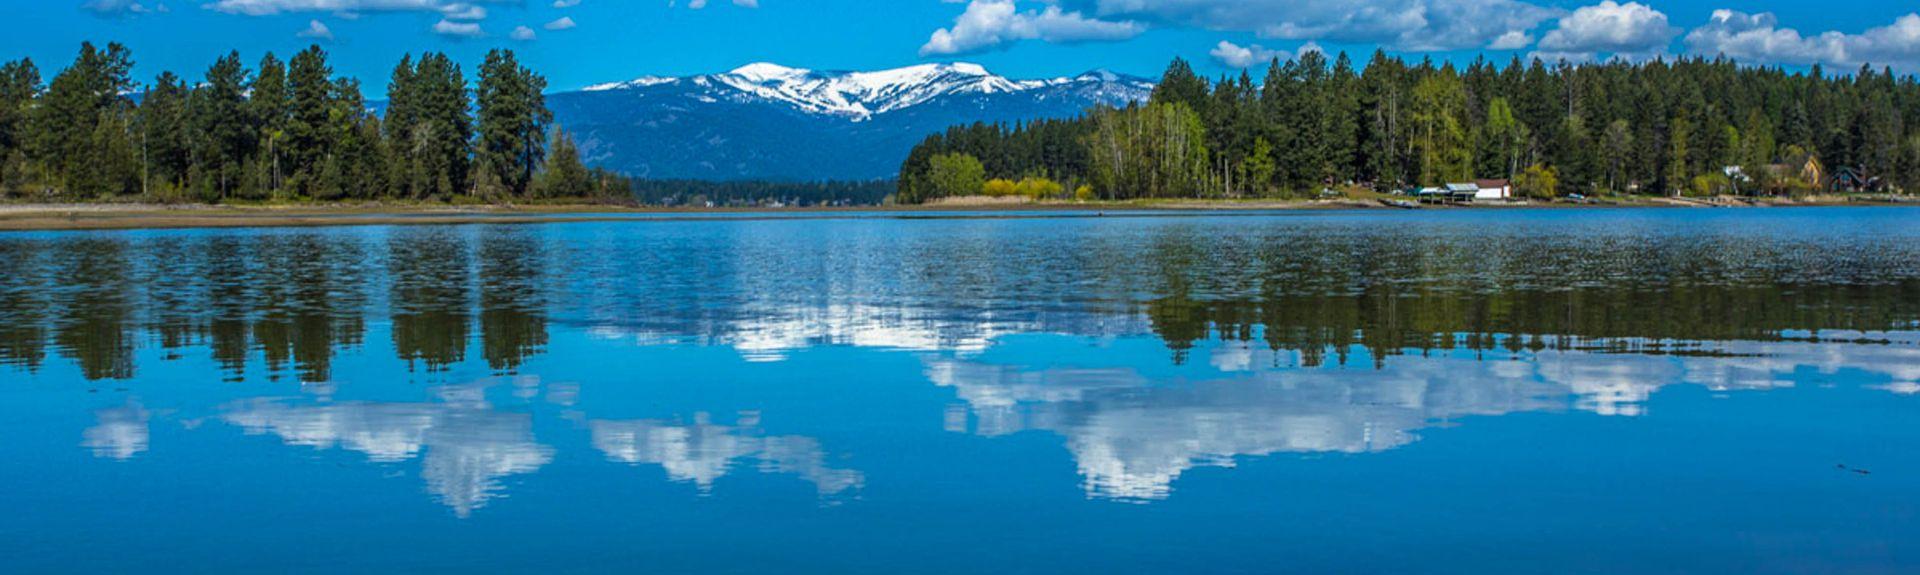 Kootenai, Idaho, USA